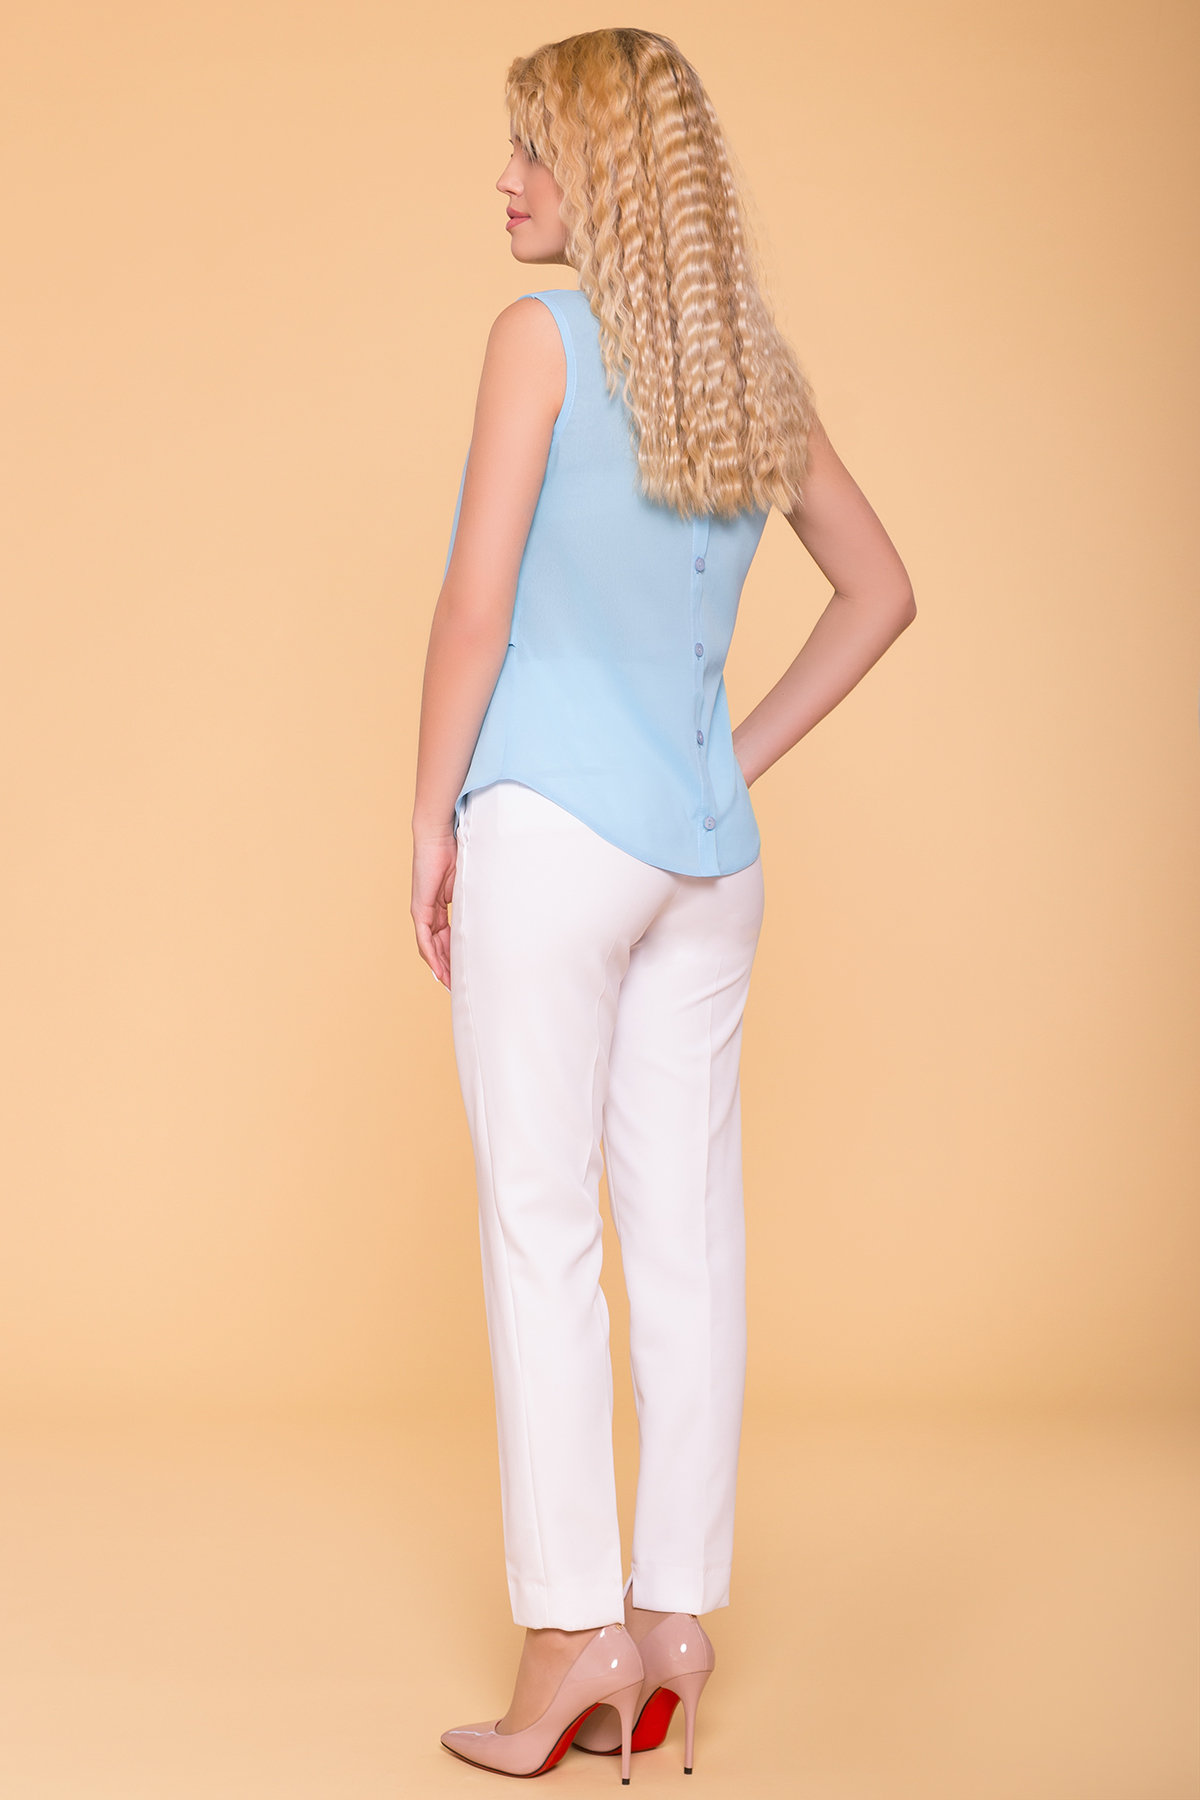 Блуза Арома 5275 АРТ. 37047 Цвет: Голубой - фото 2, интернет магазин tm-modus.ru